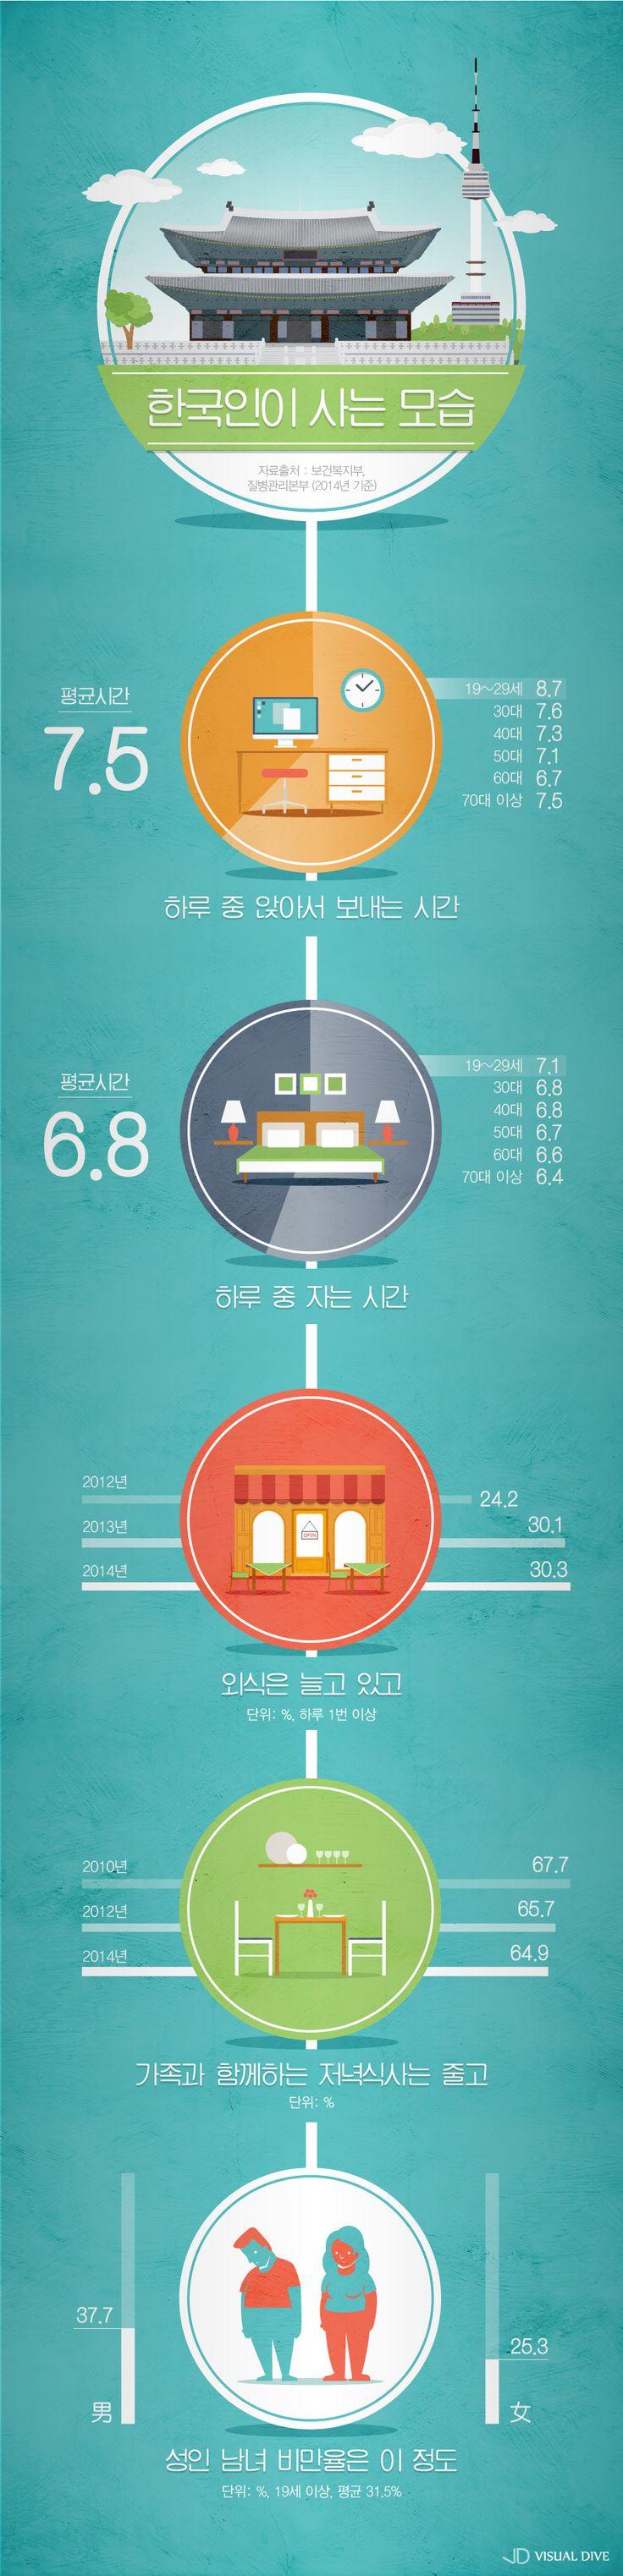 vd-korean-160114-01